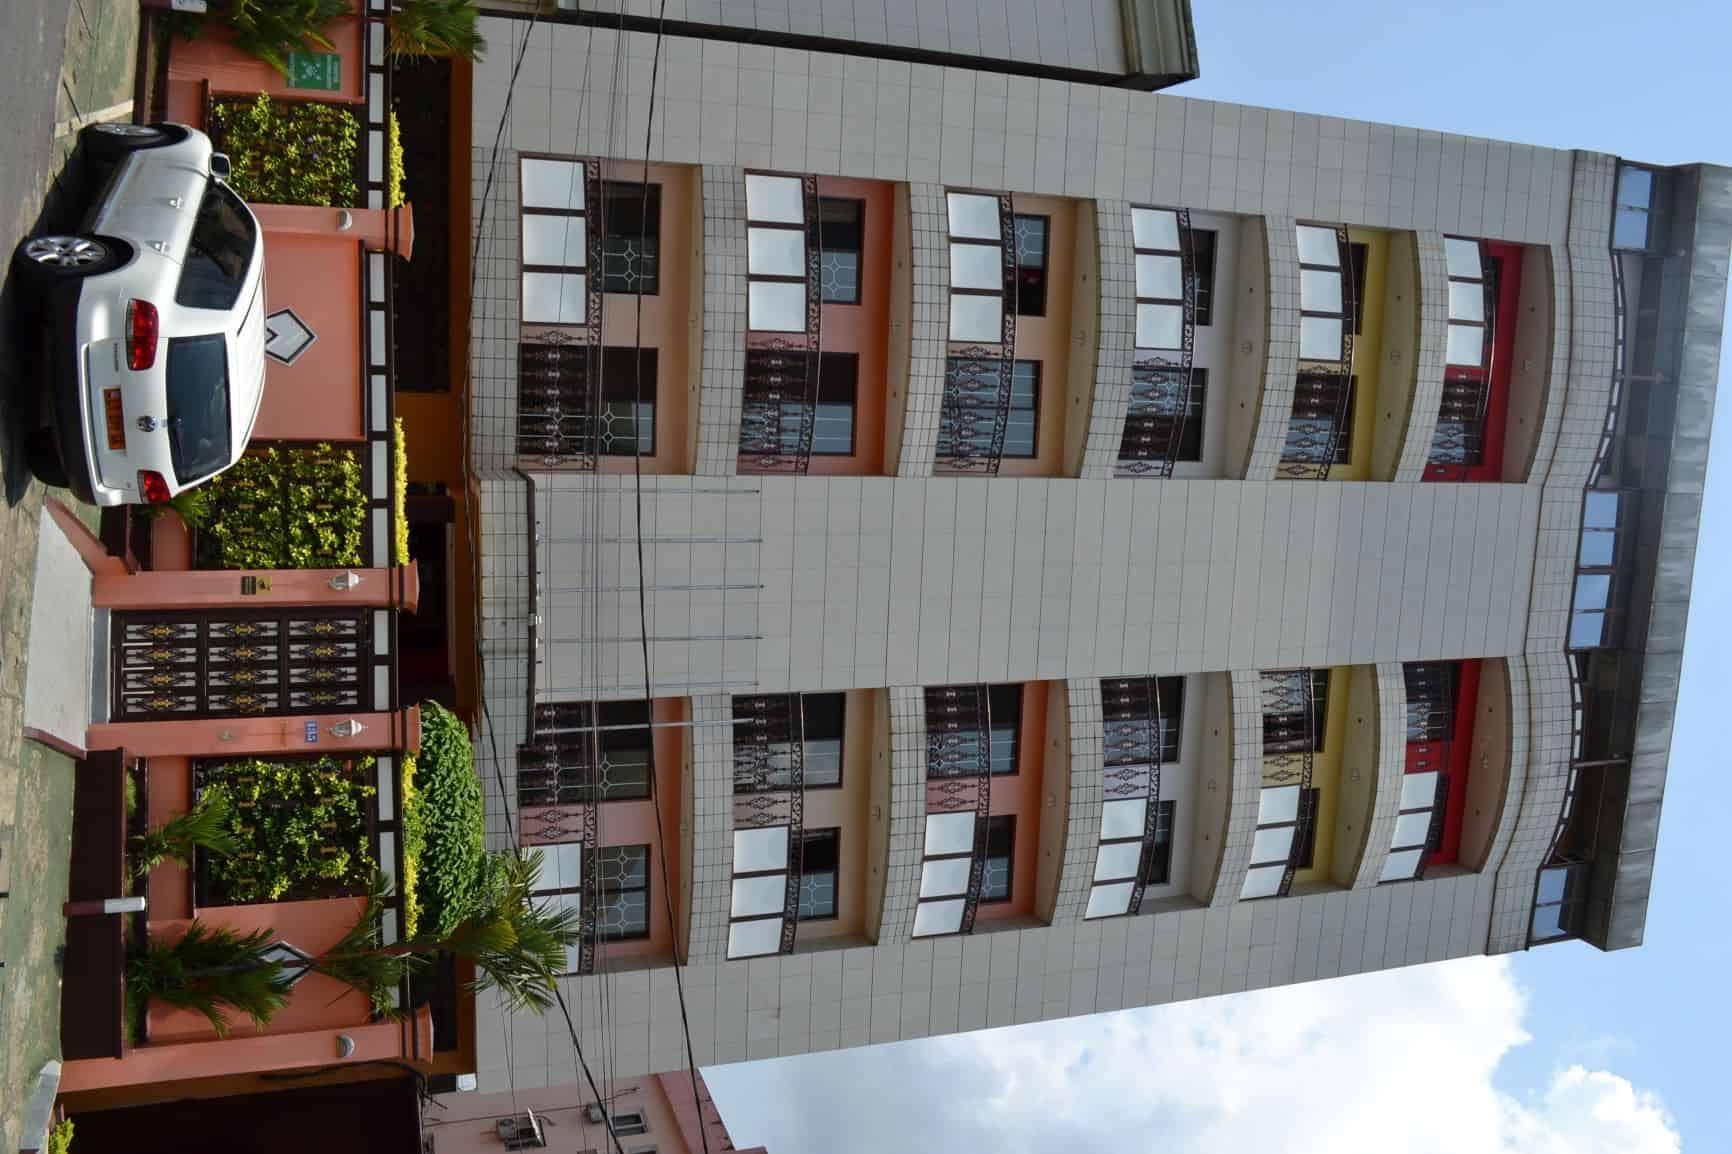 Apartment to rent - Douala, Bonanjo, Face Commissariat EMI-IMMIGRATION - 1 living room(s), 1 bedroom(s), 1 bathroom(s) - 650 000 FCFA / month